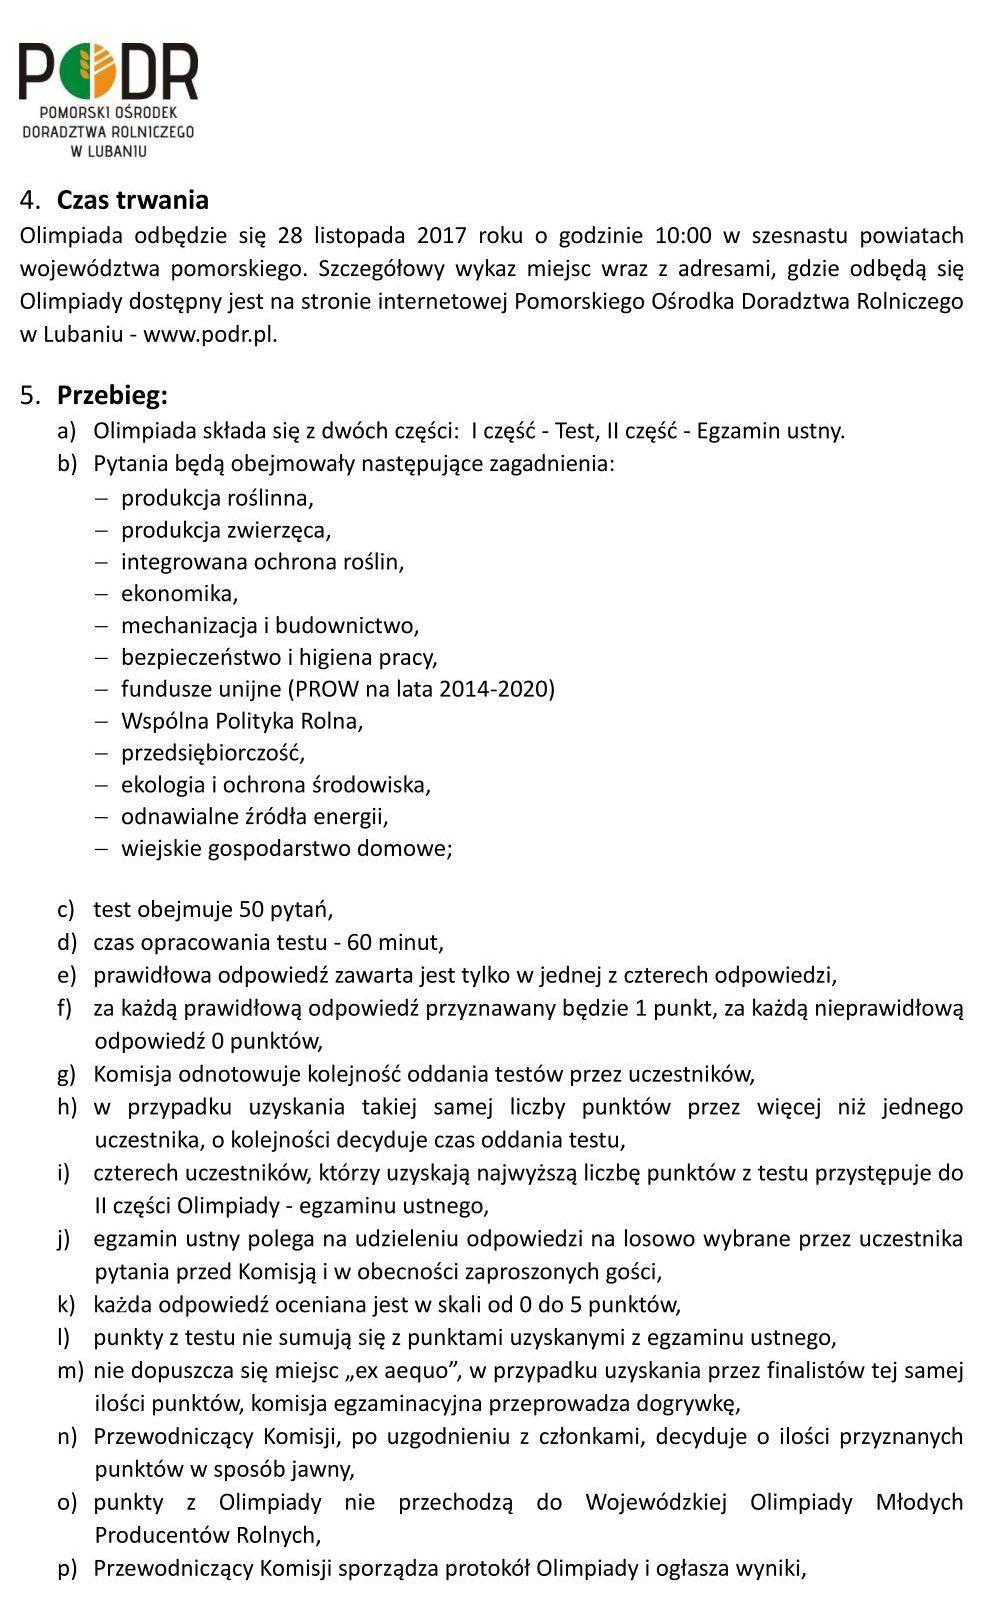 Regulamin Powiatowej-OMPR 2017_02